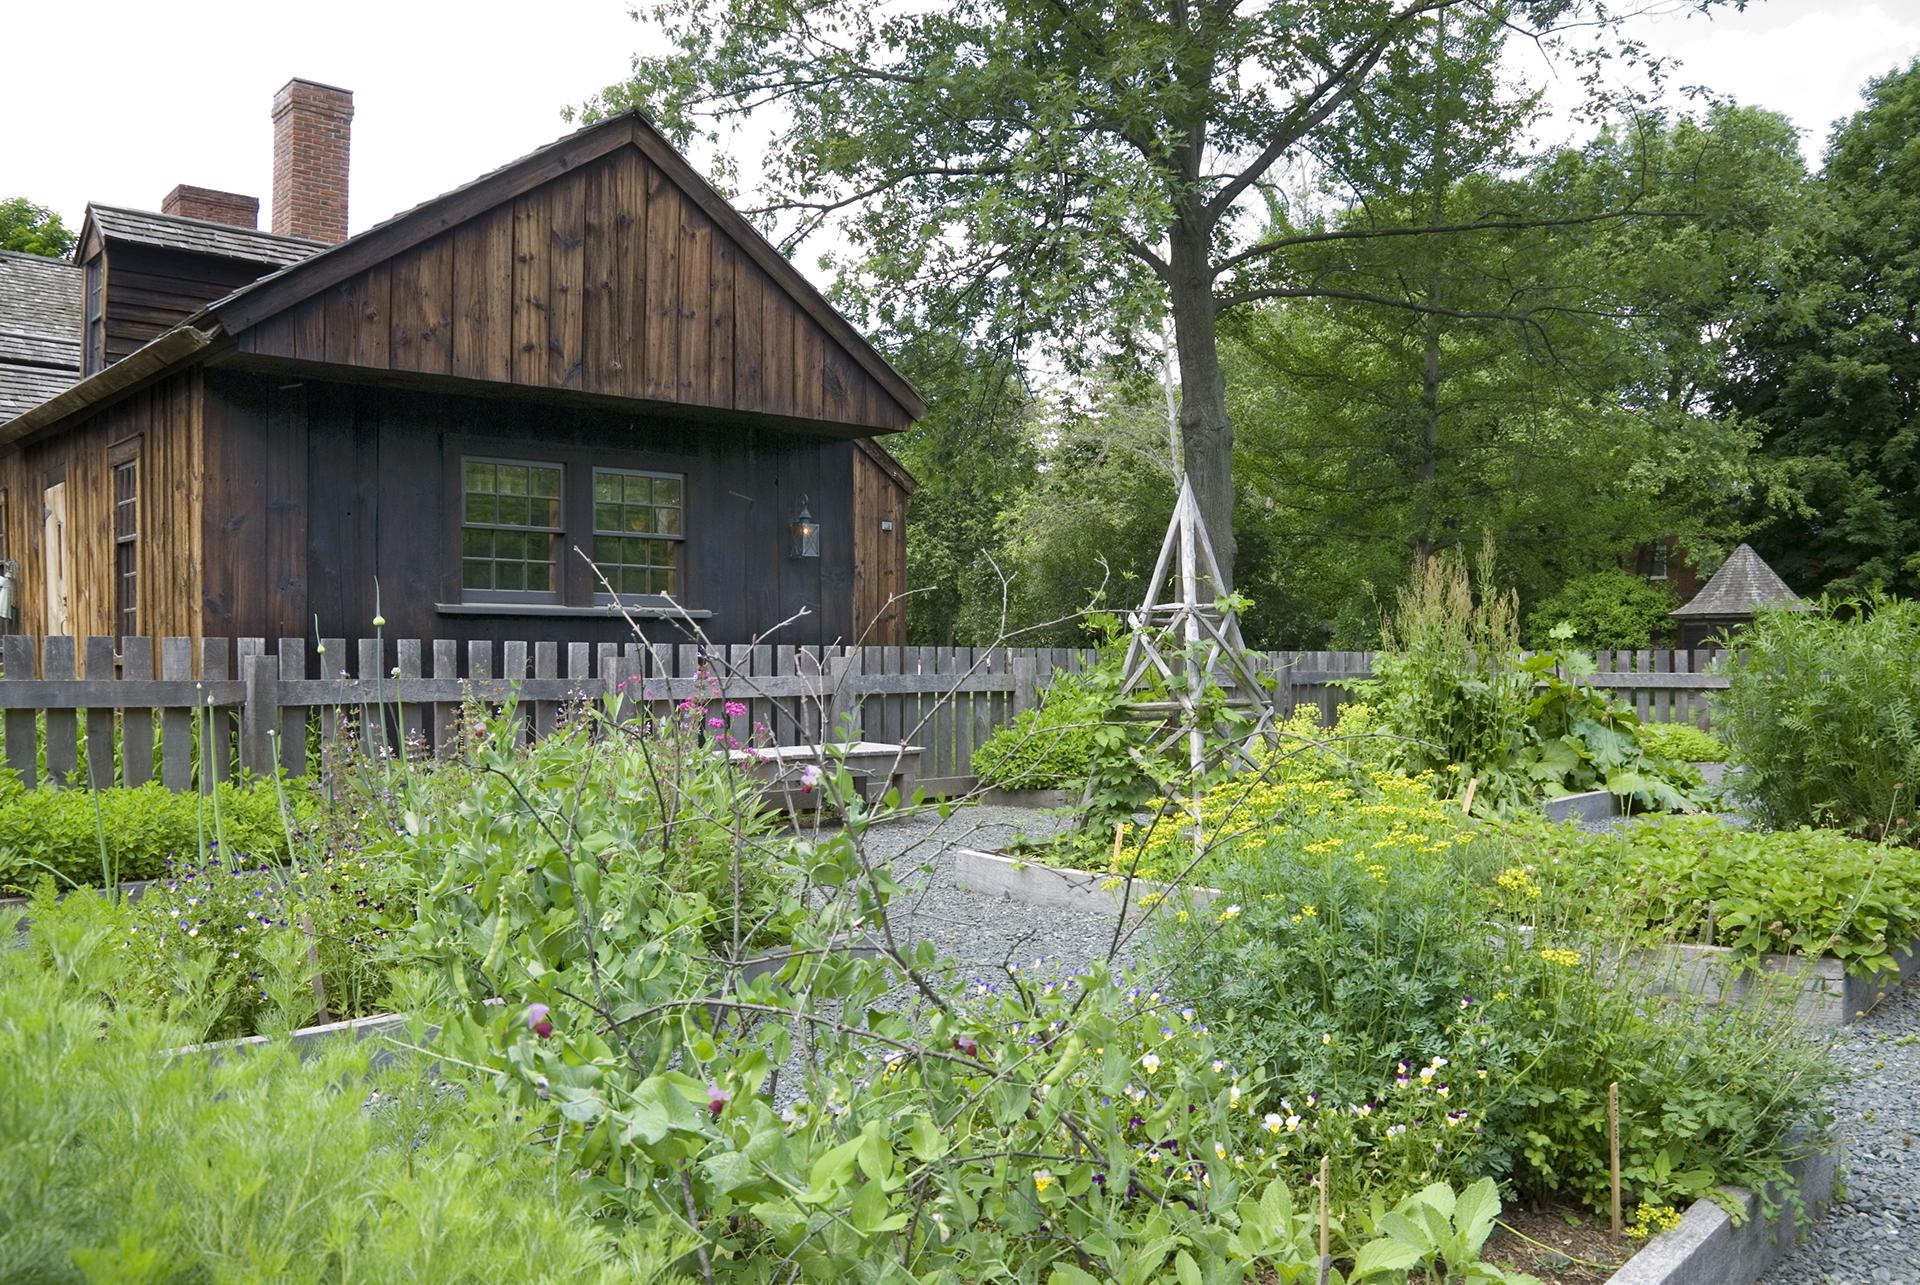 The Cooks' Garden